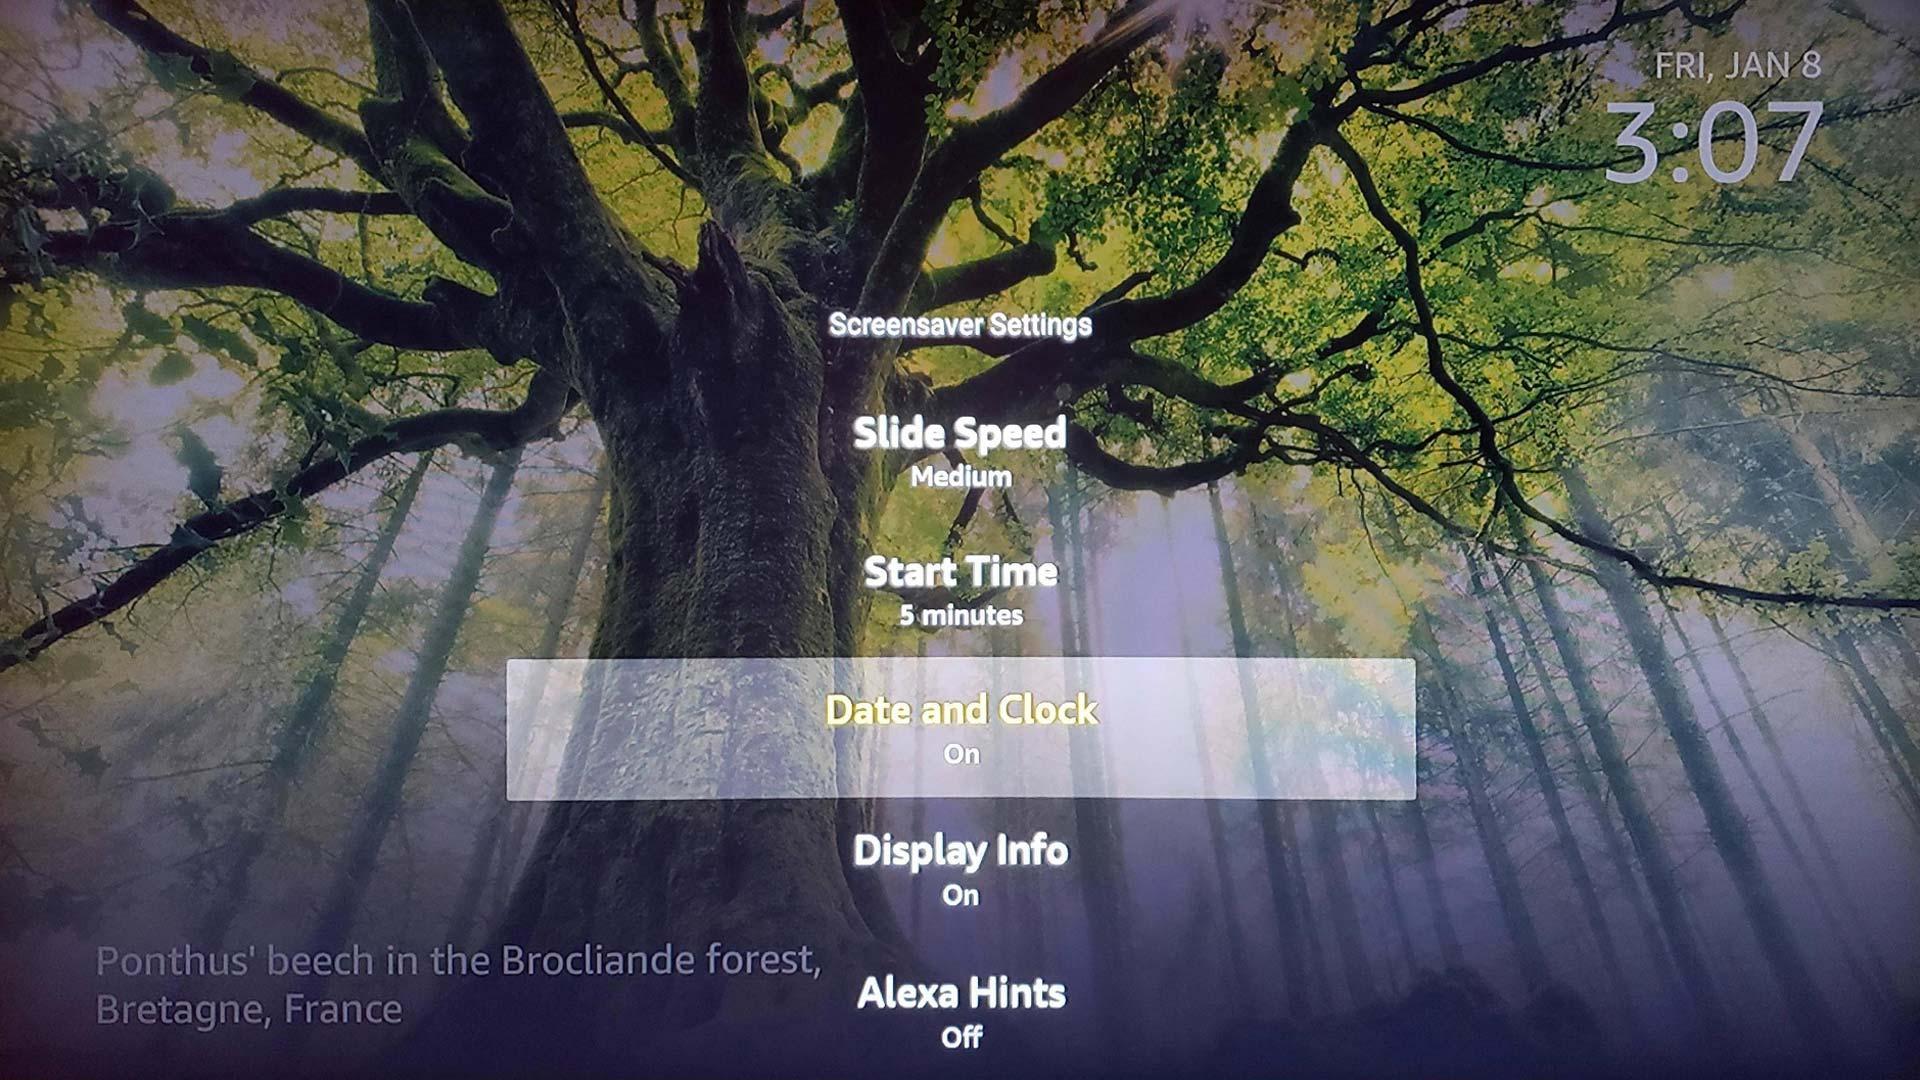 Fire Tv Screensaver Gains Date And Clock Display Option Aftvnews